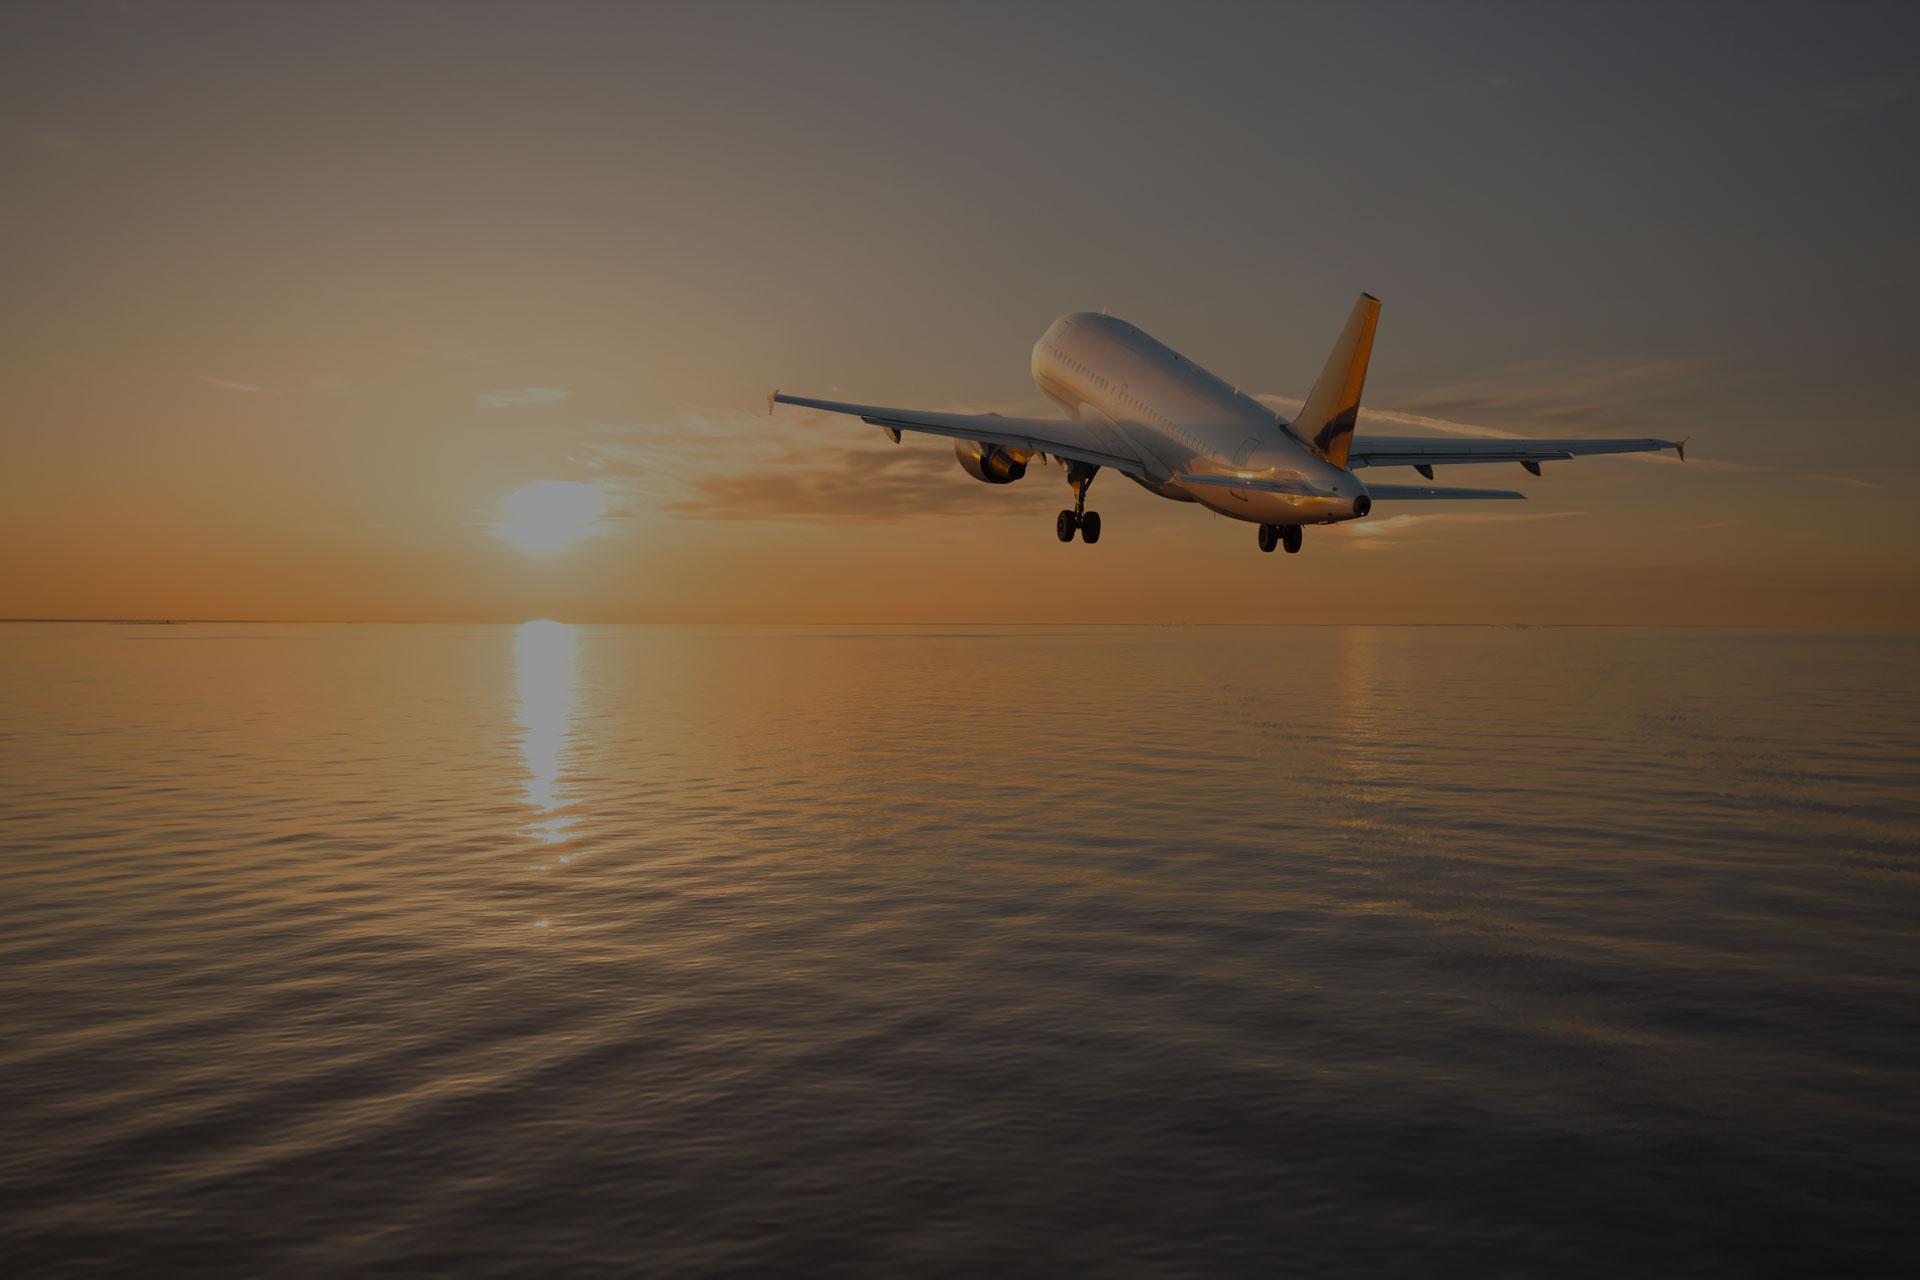 Aeroplane flying over ocean